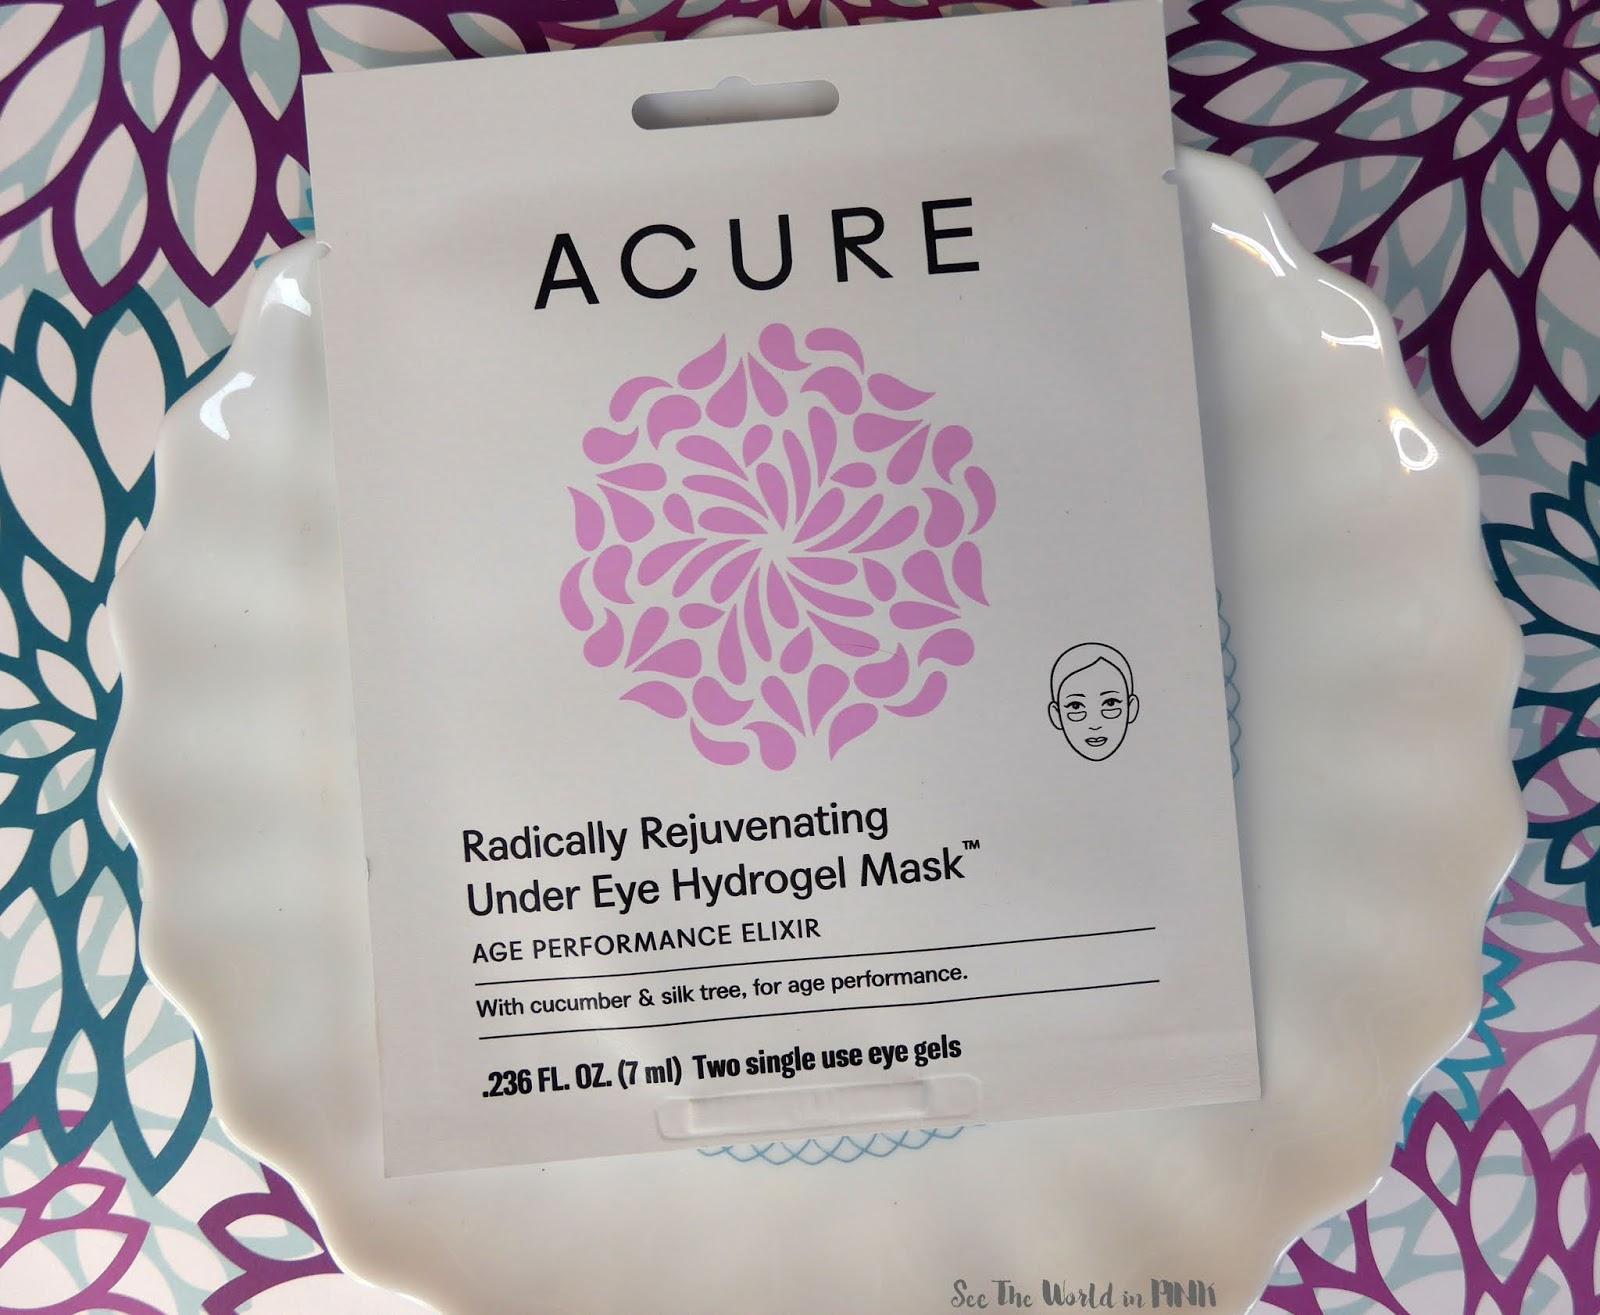 Acure Radically Rejuvenating Under Eye Hydrogels Mask